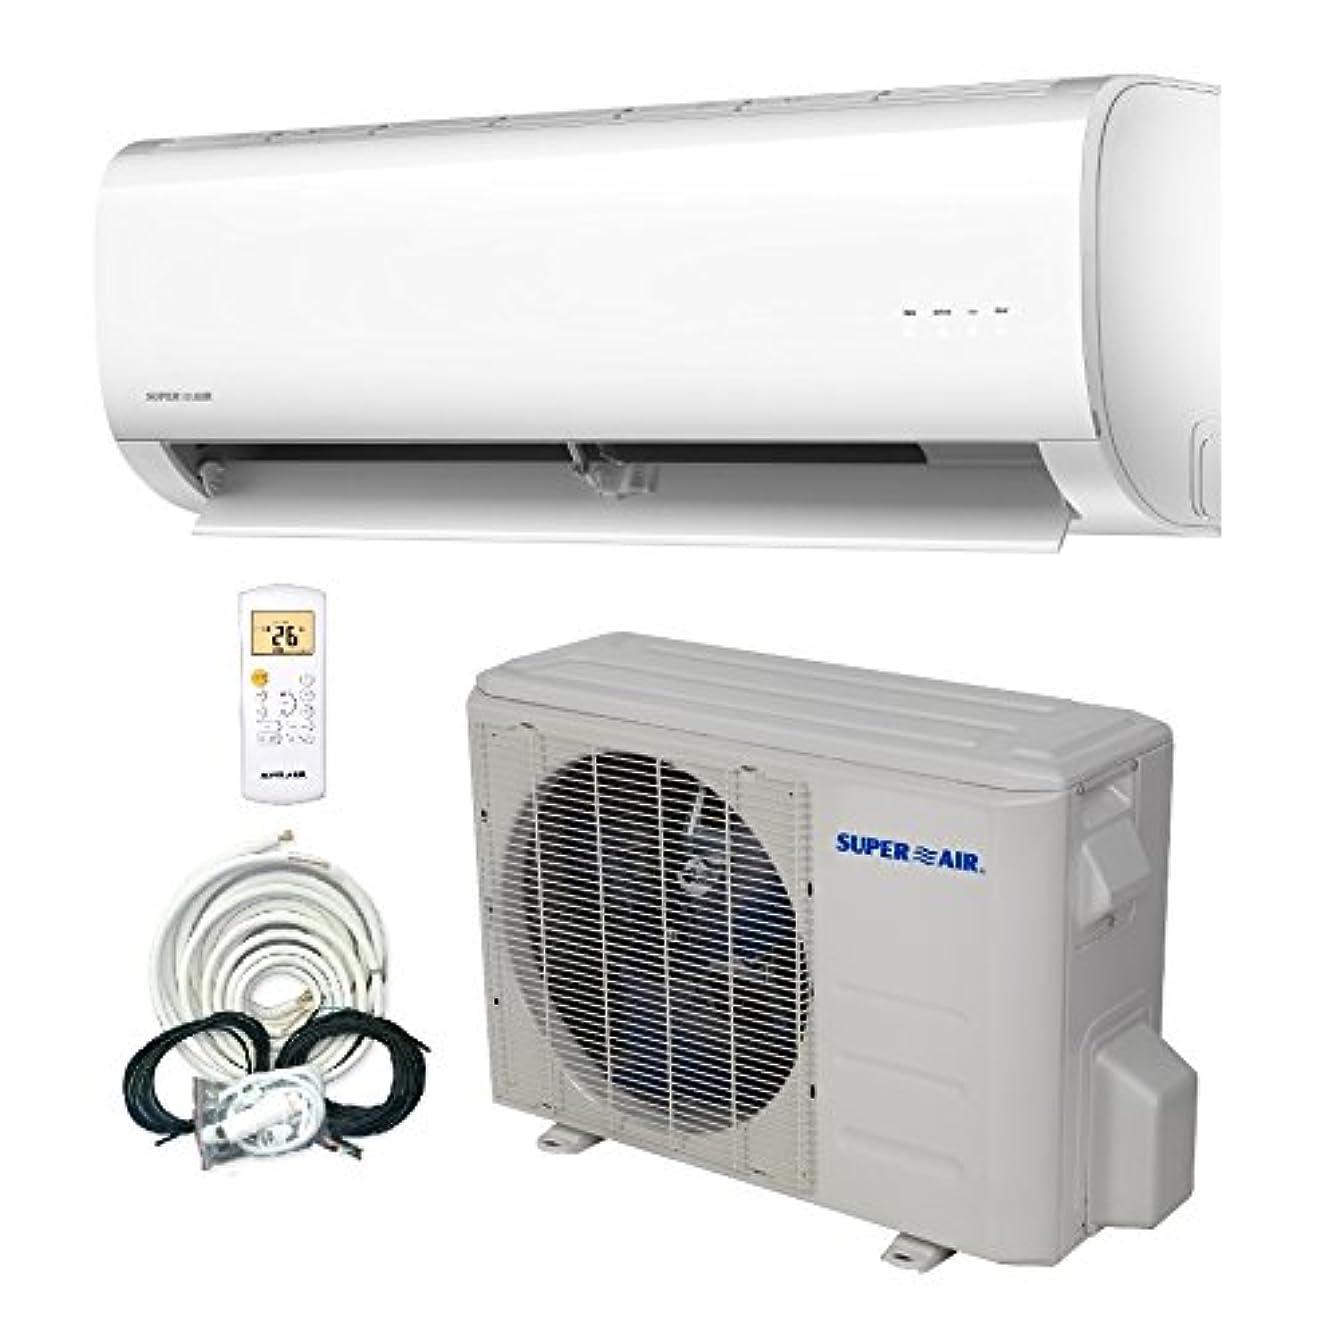 SuperAir 9000 BTU 15 SEER (3/4 TON) Ductless Mini Split System Inverter Air Conditioner with Heat Pump 110V - FULL SET